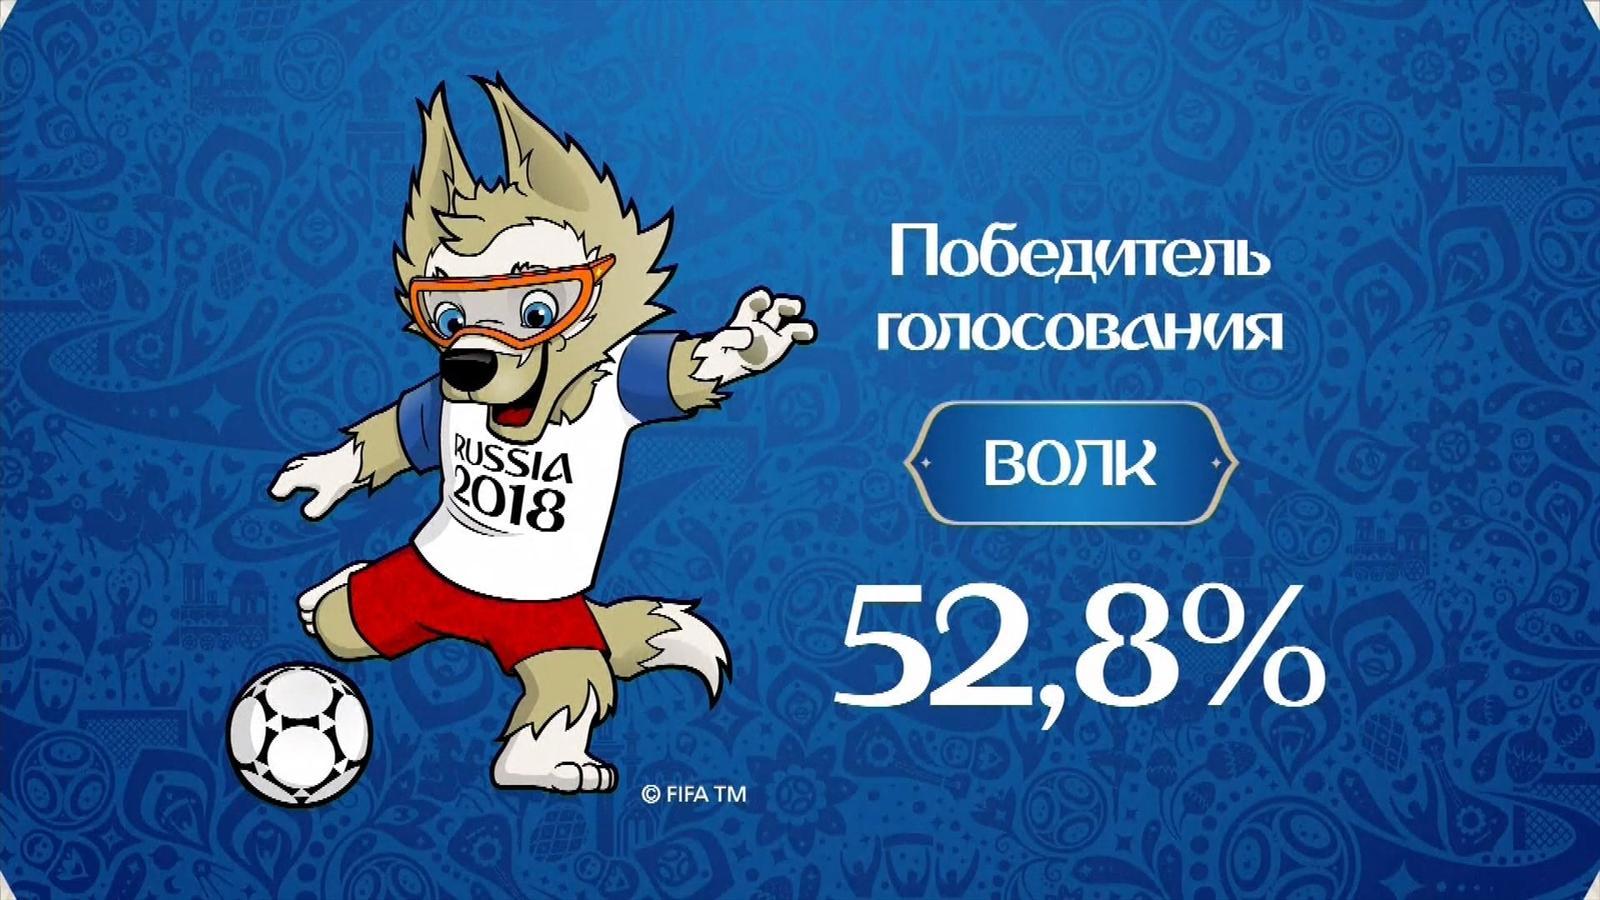 [FA] Zabivaka Wolf Mascot of FIFA World Cup 2018 [Full] by